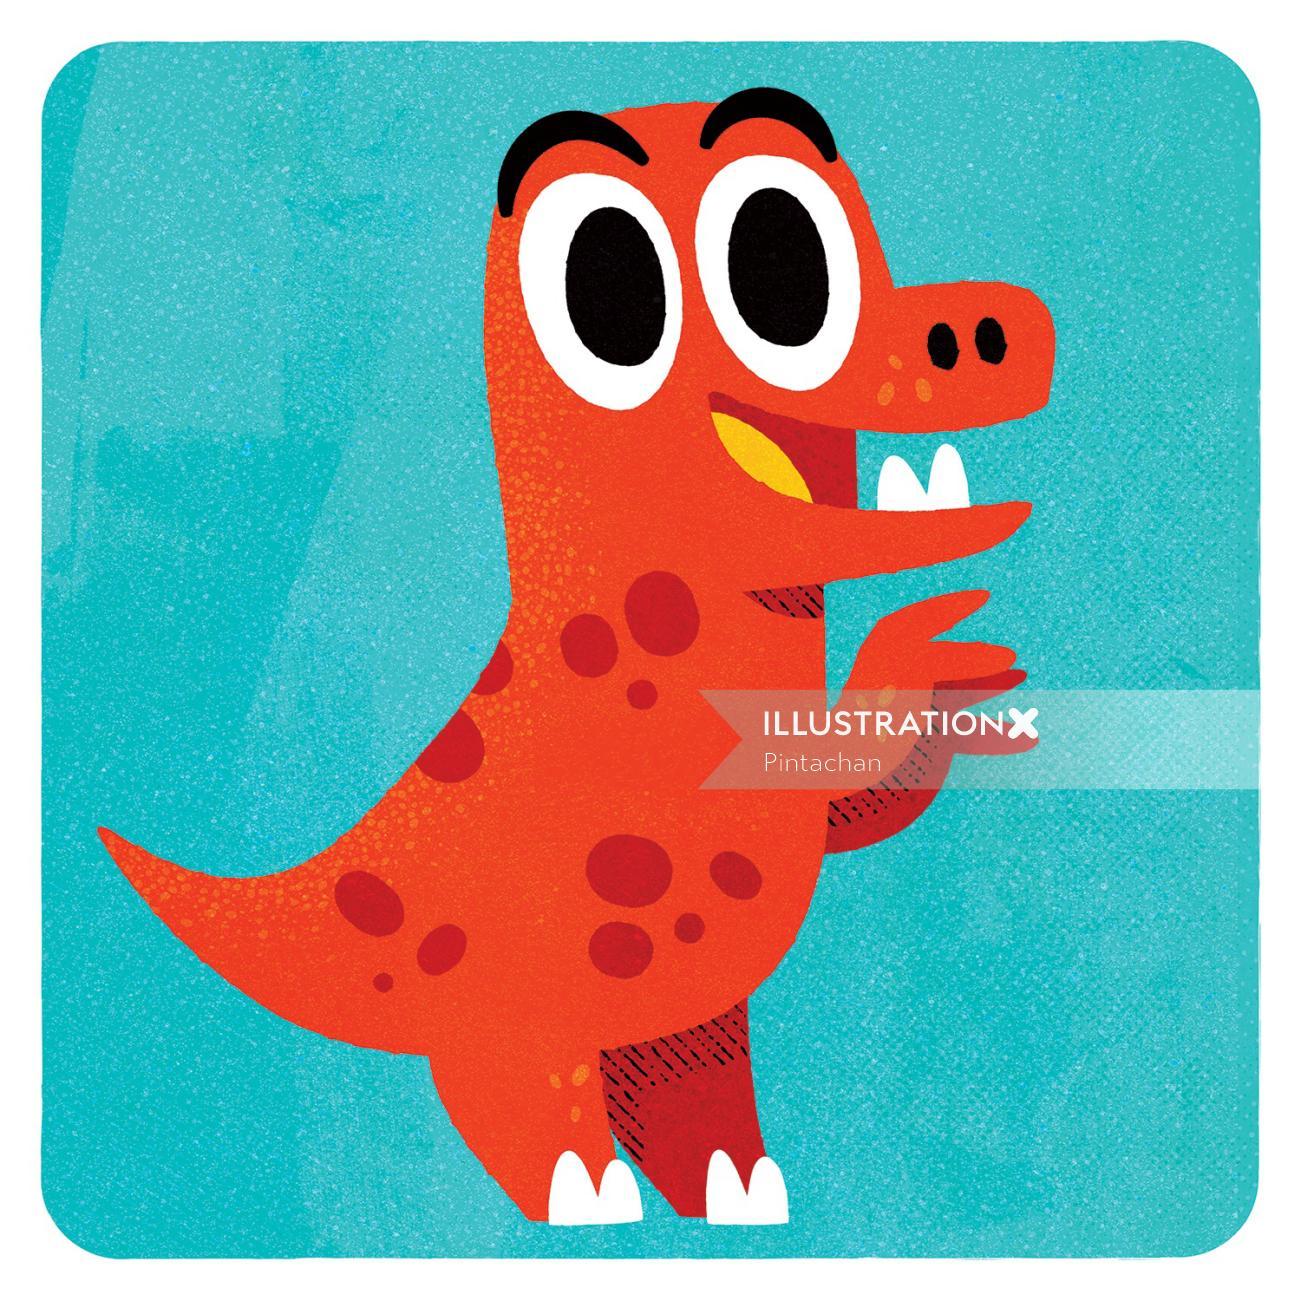 Red Dinosaur illustration by Pintachan